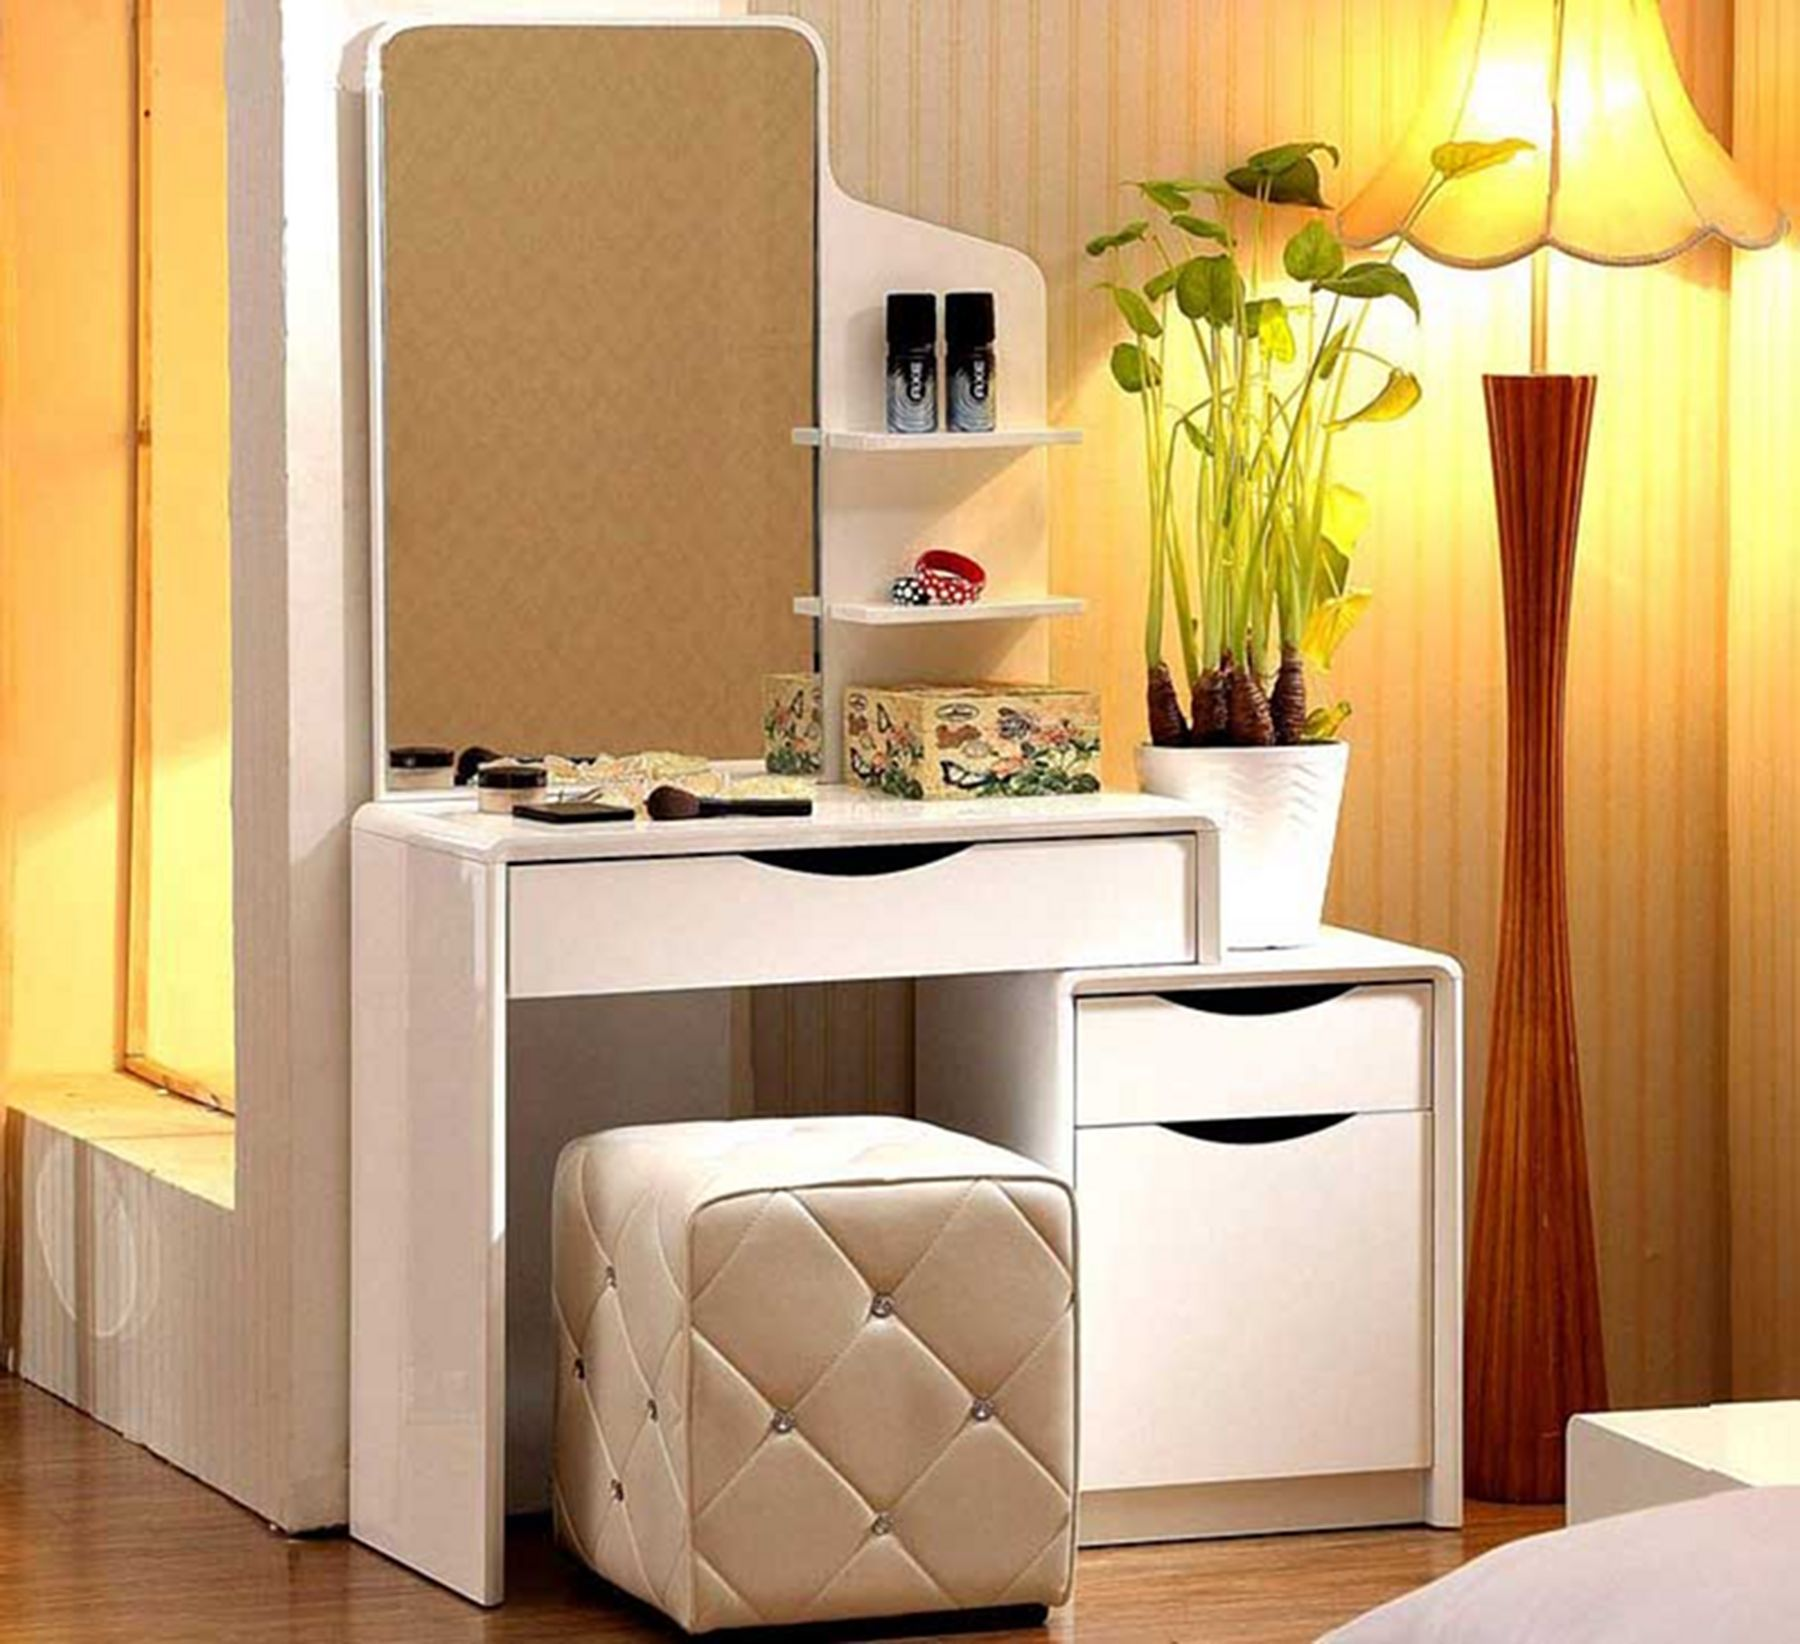 Dressing Bedroom Ideas Dressing Table Design Minimalist Dressing Tables Dressing Room Decor